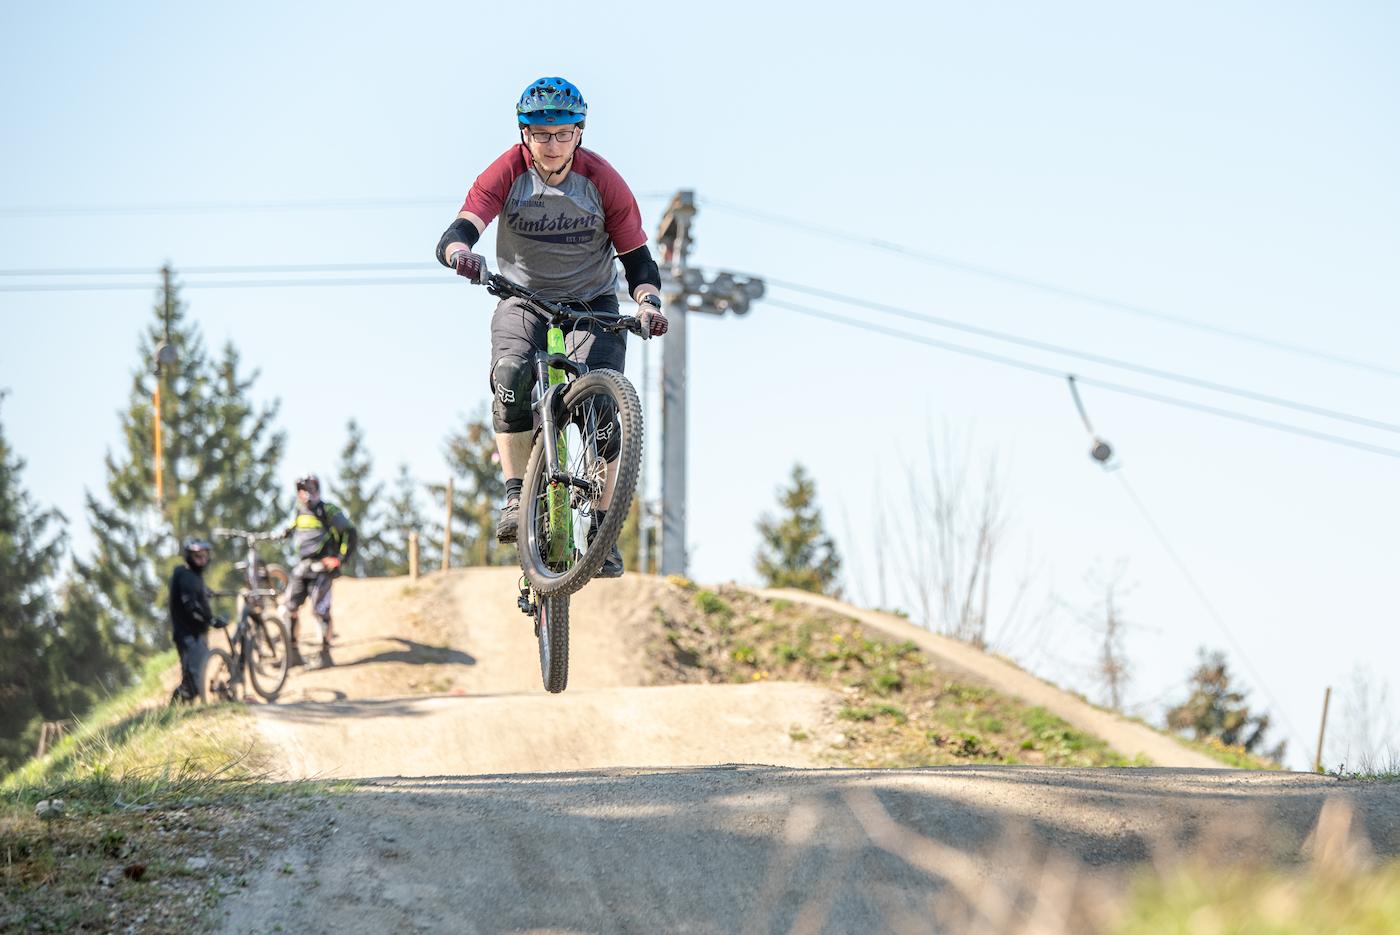 MTB Sprung & Drop Kurs in Olpe Sauerland - Fahrtechnik Training Rock my Trail Bikeschule